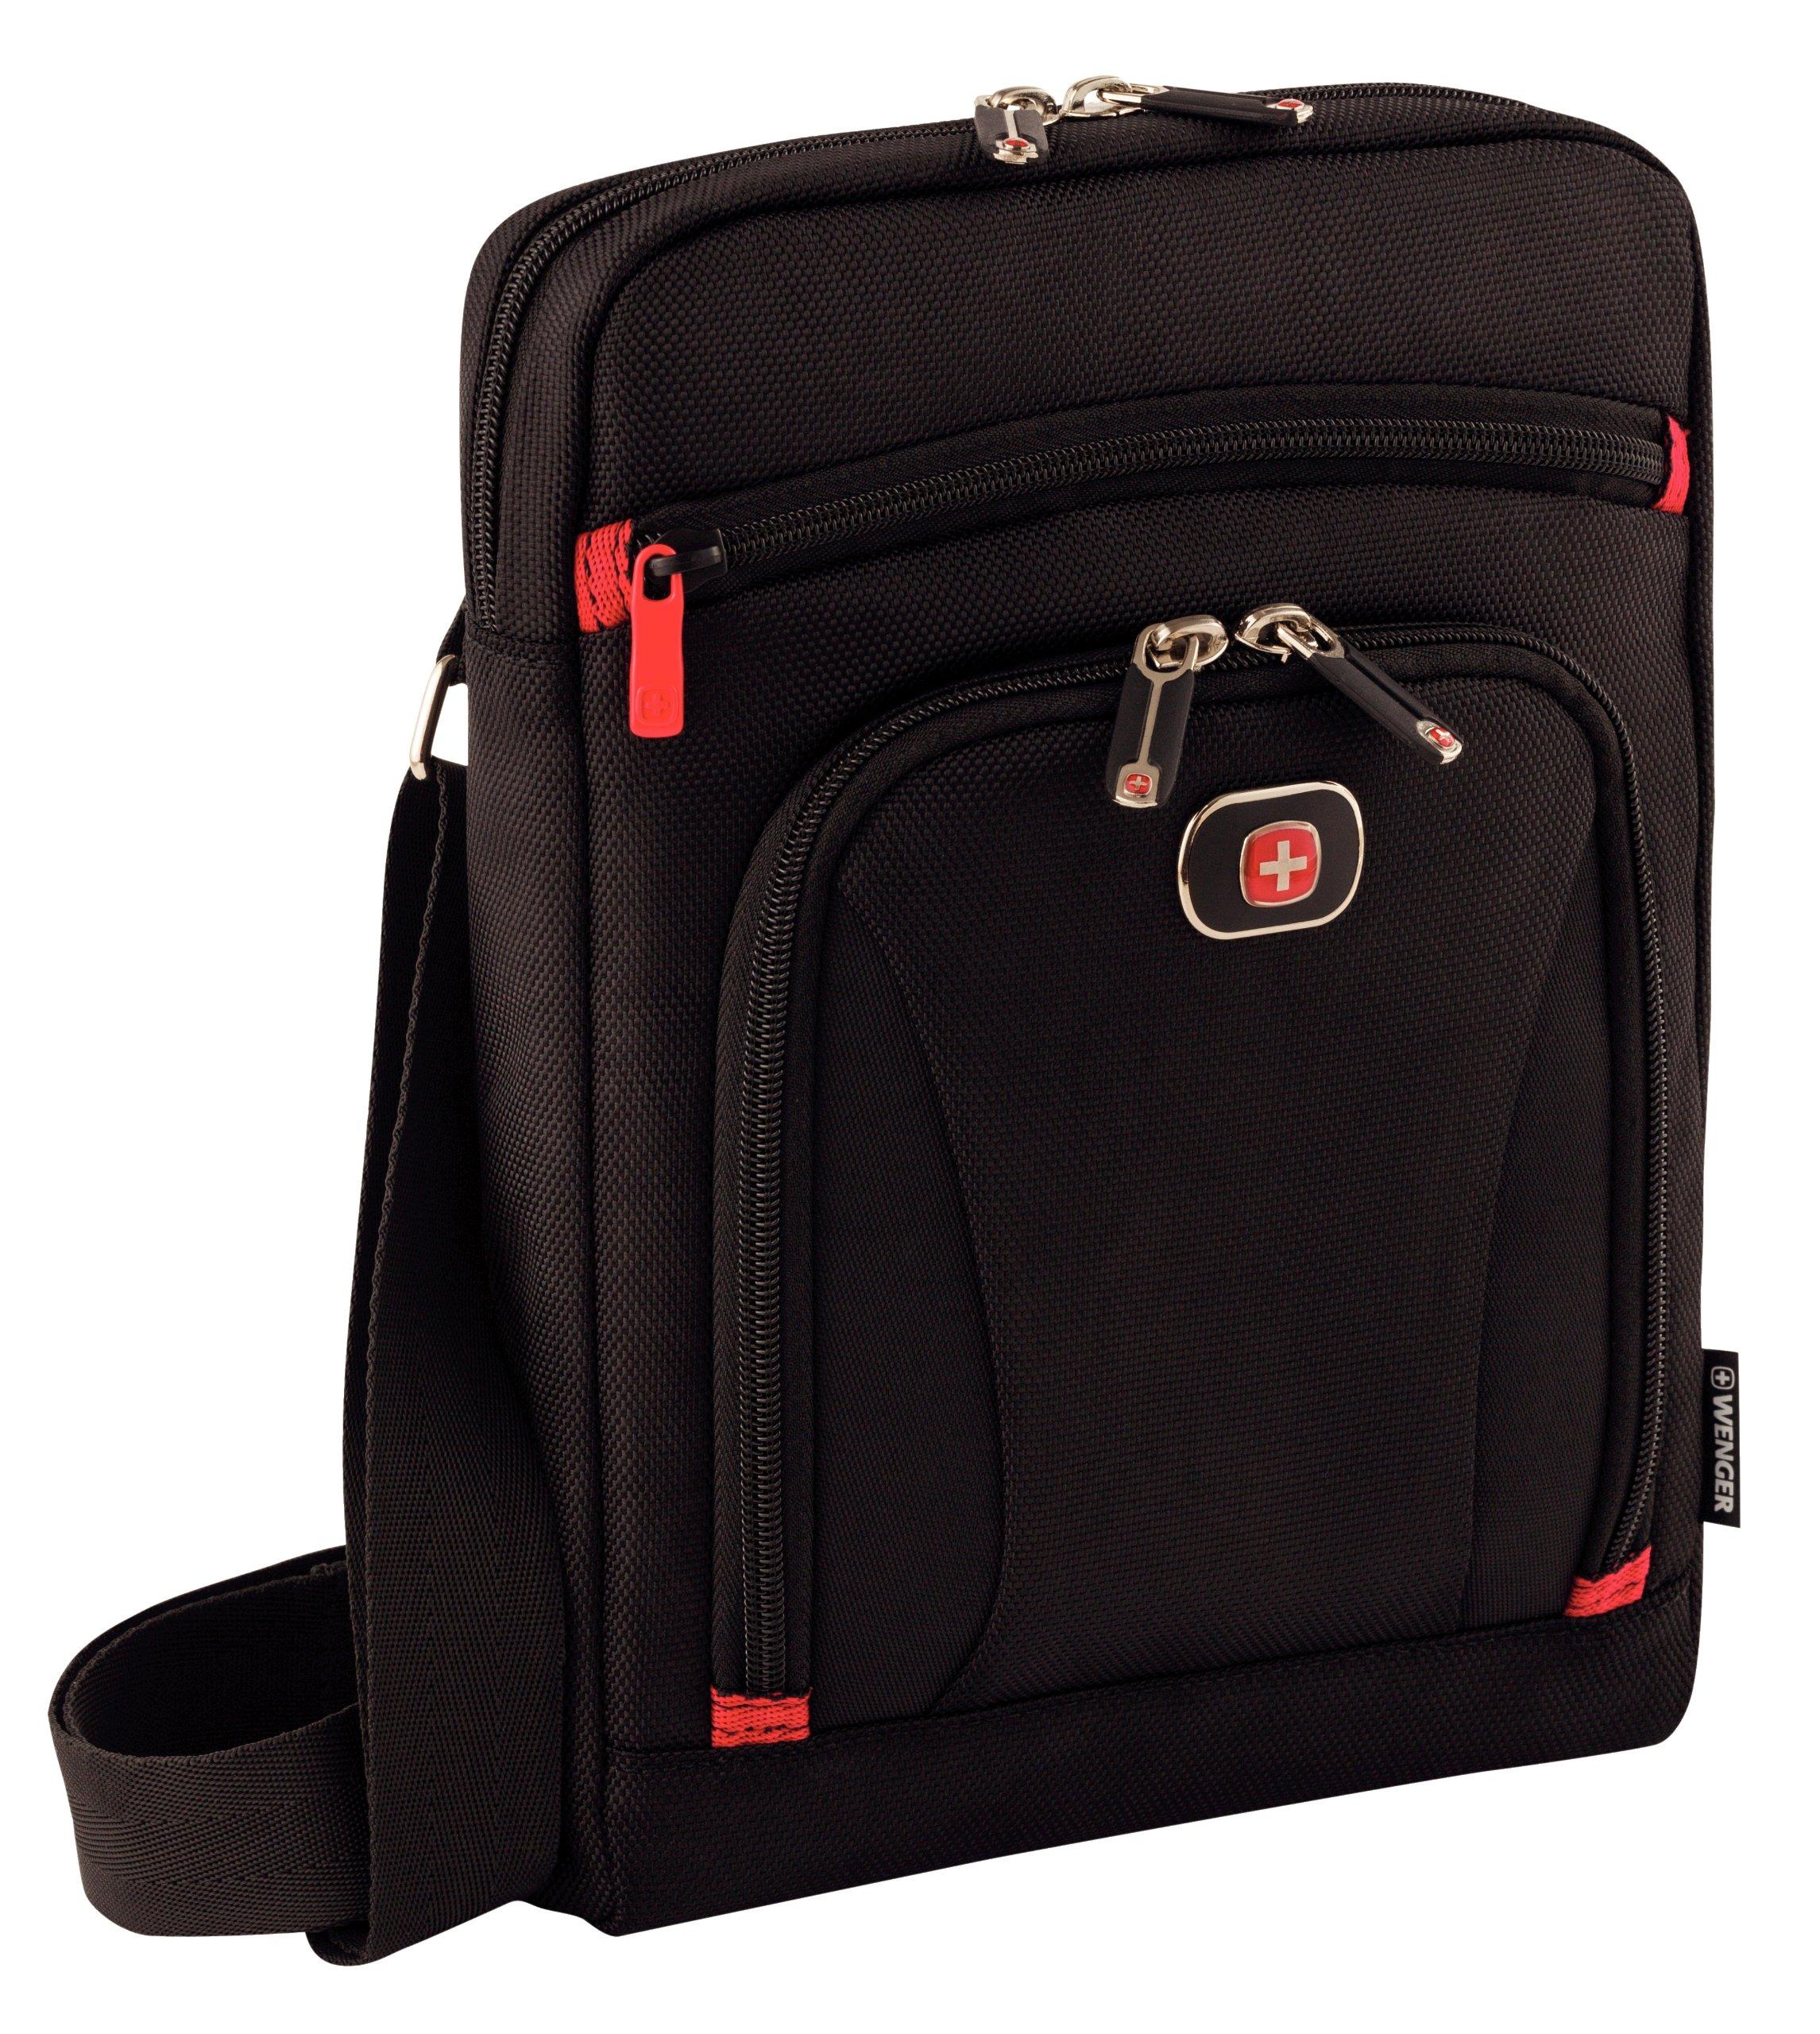 91C0ieUekTL - Wenger Swissgear Status - Maletín para Tablet iPad Air, Negro